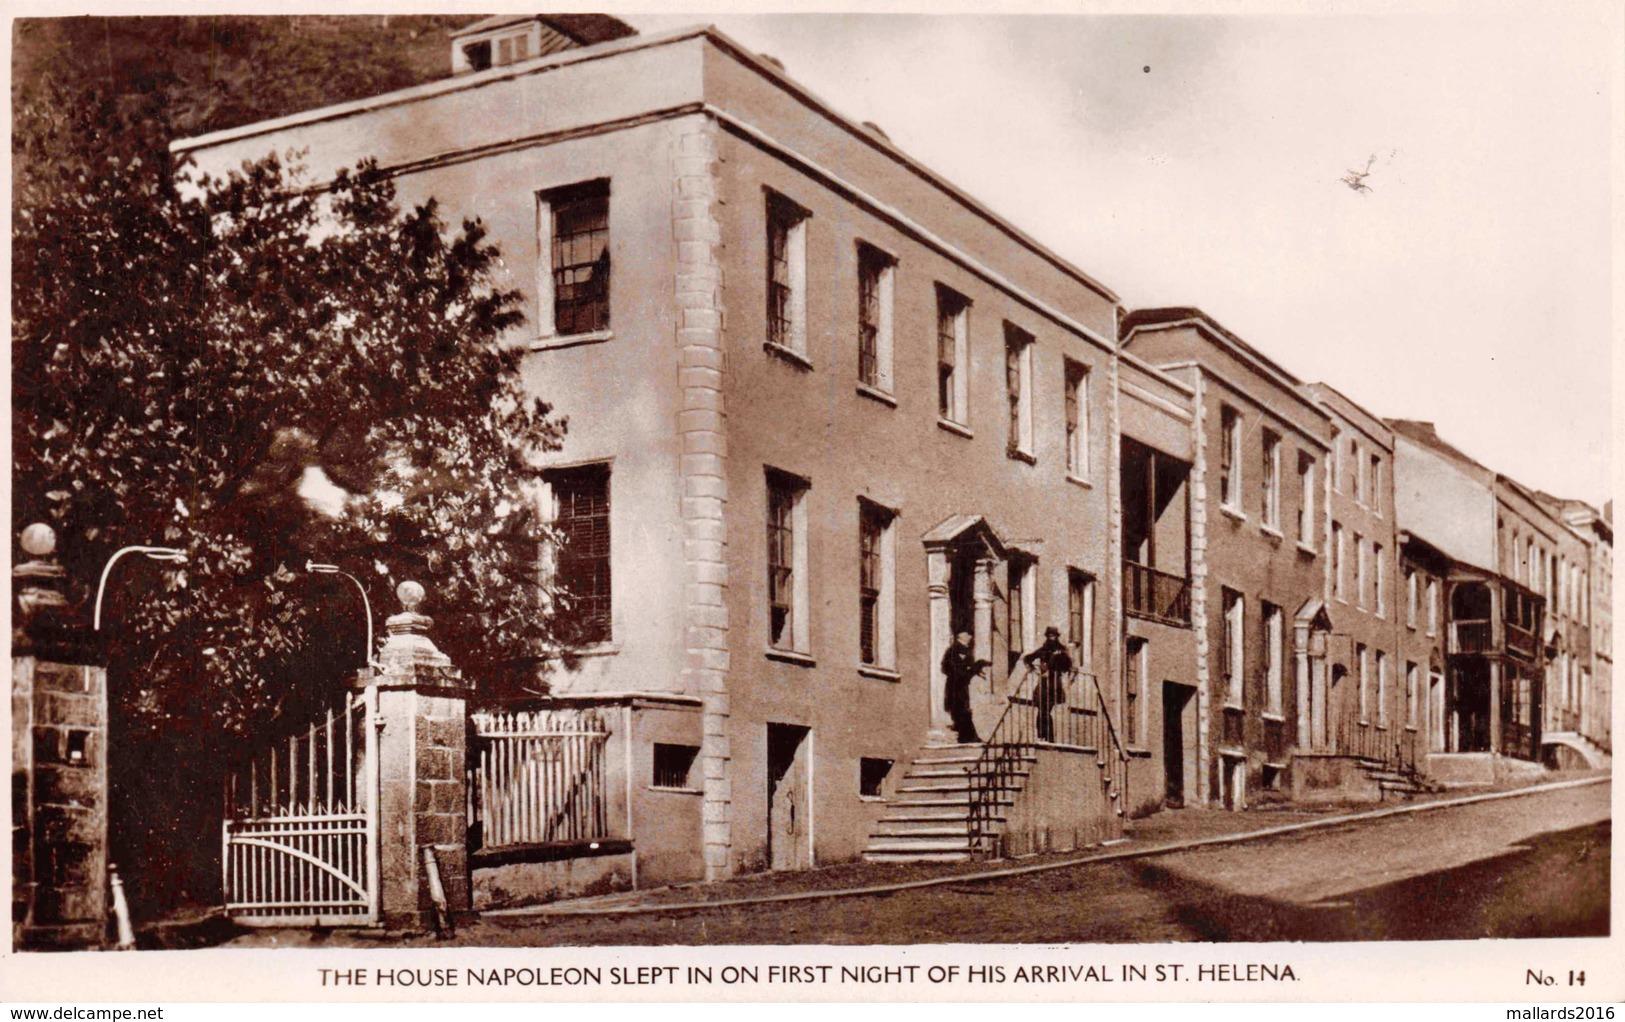 ST. HELENA - THE HOUSE NAPOLEON SLEPT ON HIS 1st NIGHT ~ PHOTO POSTCARD #92809 - Saint Helena Island